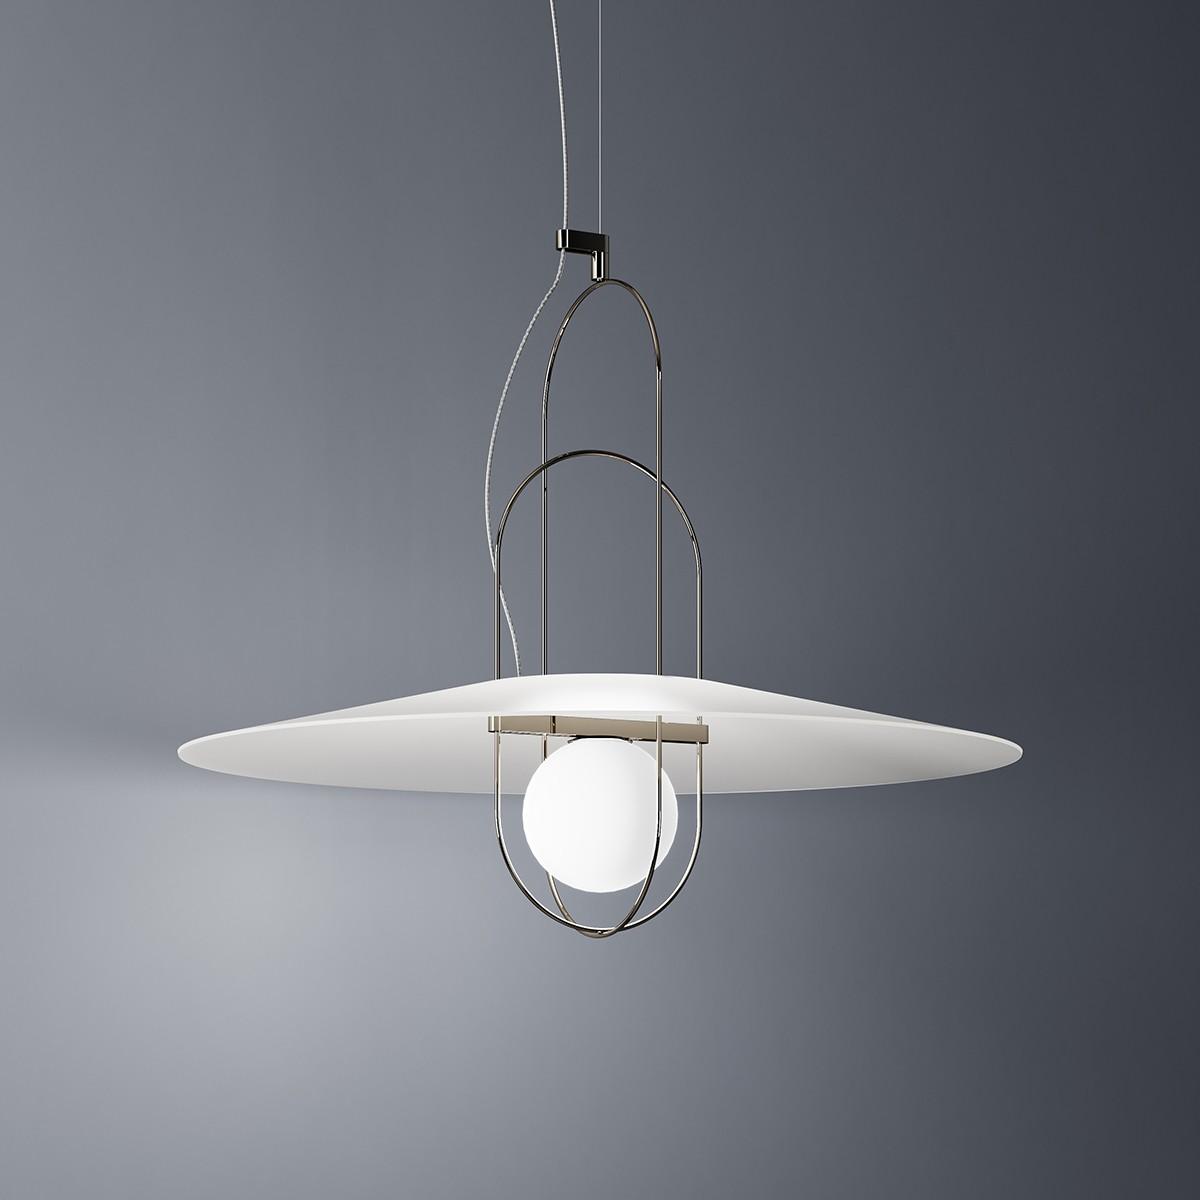 Fontana Arte Setareh 4381 LED Pendelleuchte, schwarz Nickel / Schirm: weiss